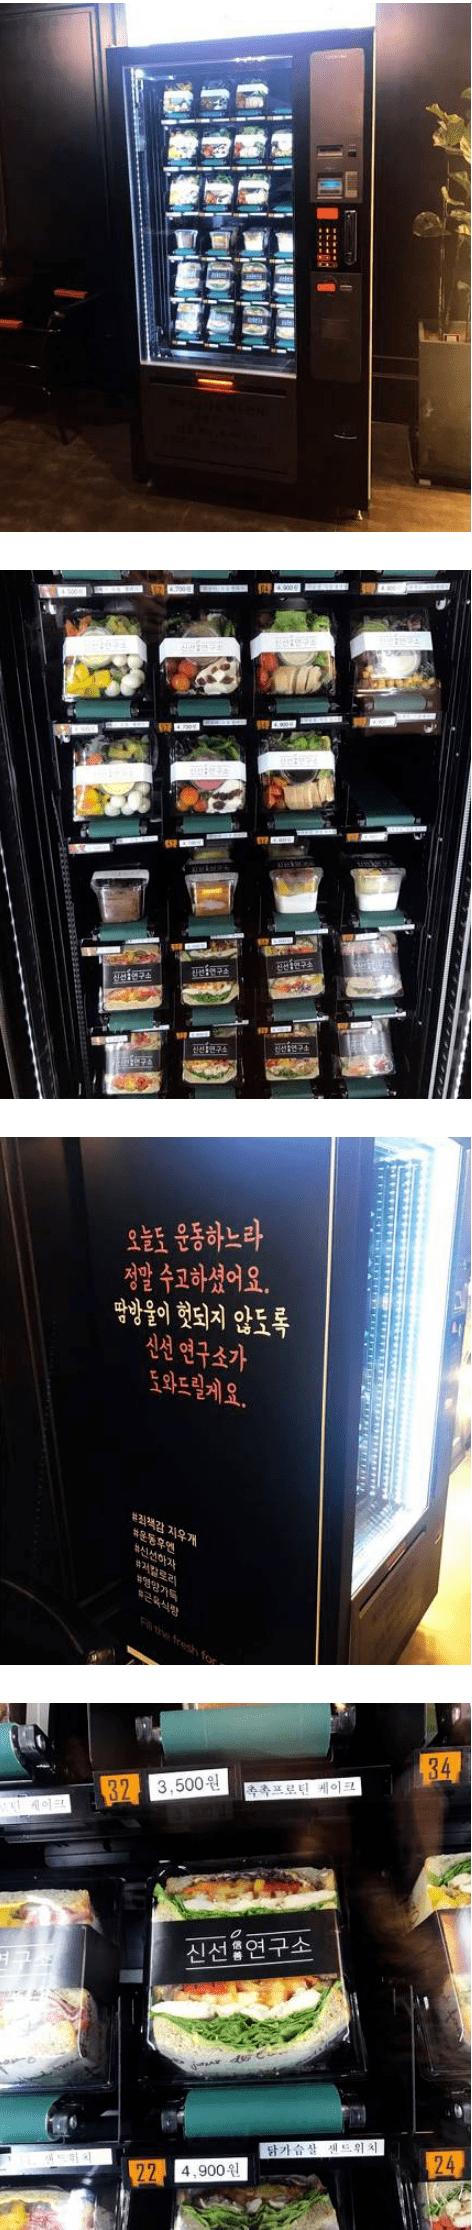 trjfcgjkvh.png 요즘 헬스장 자판기 근황.jpg